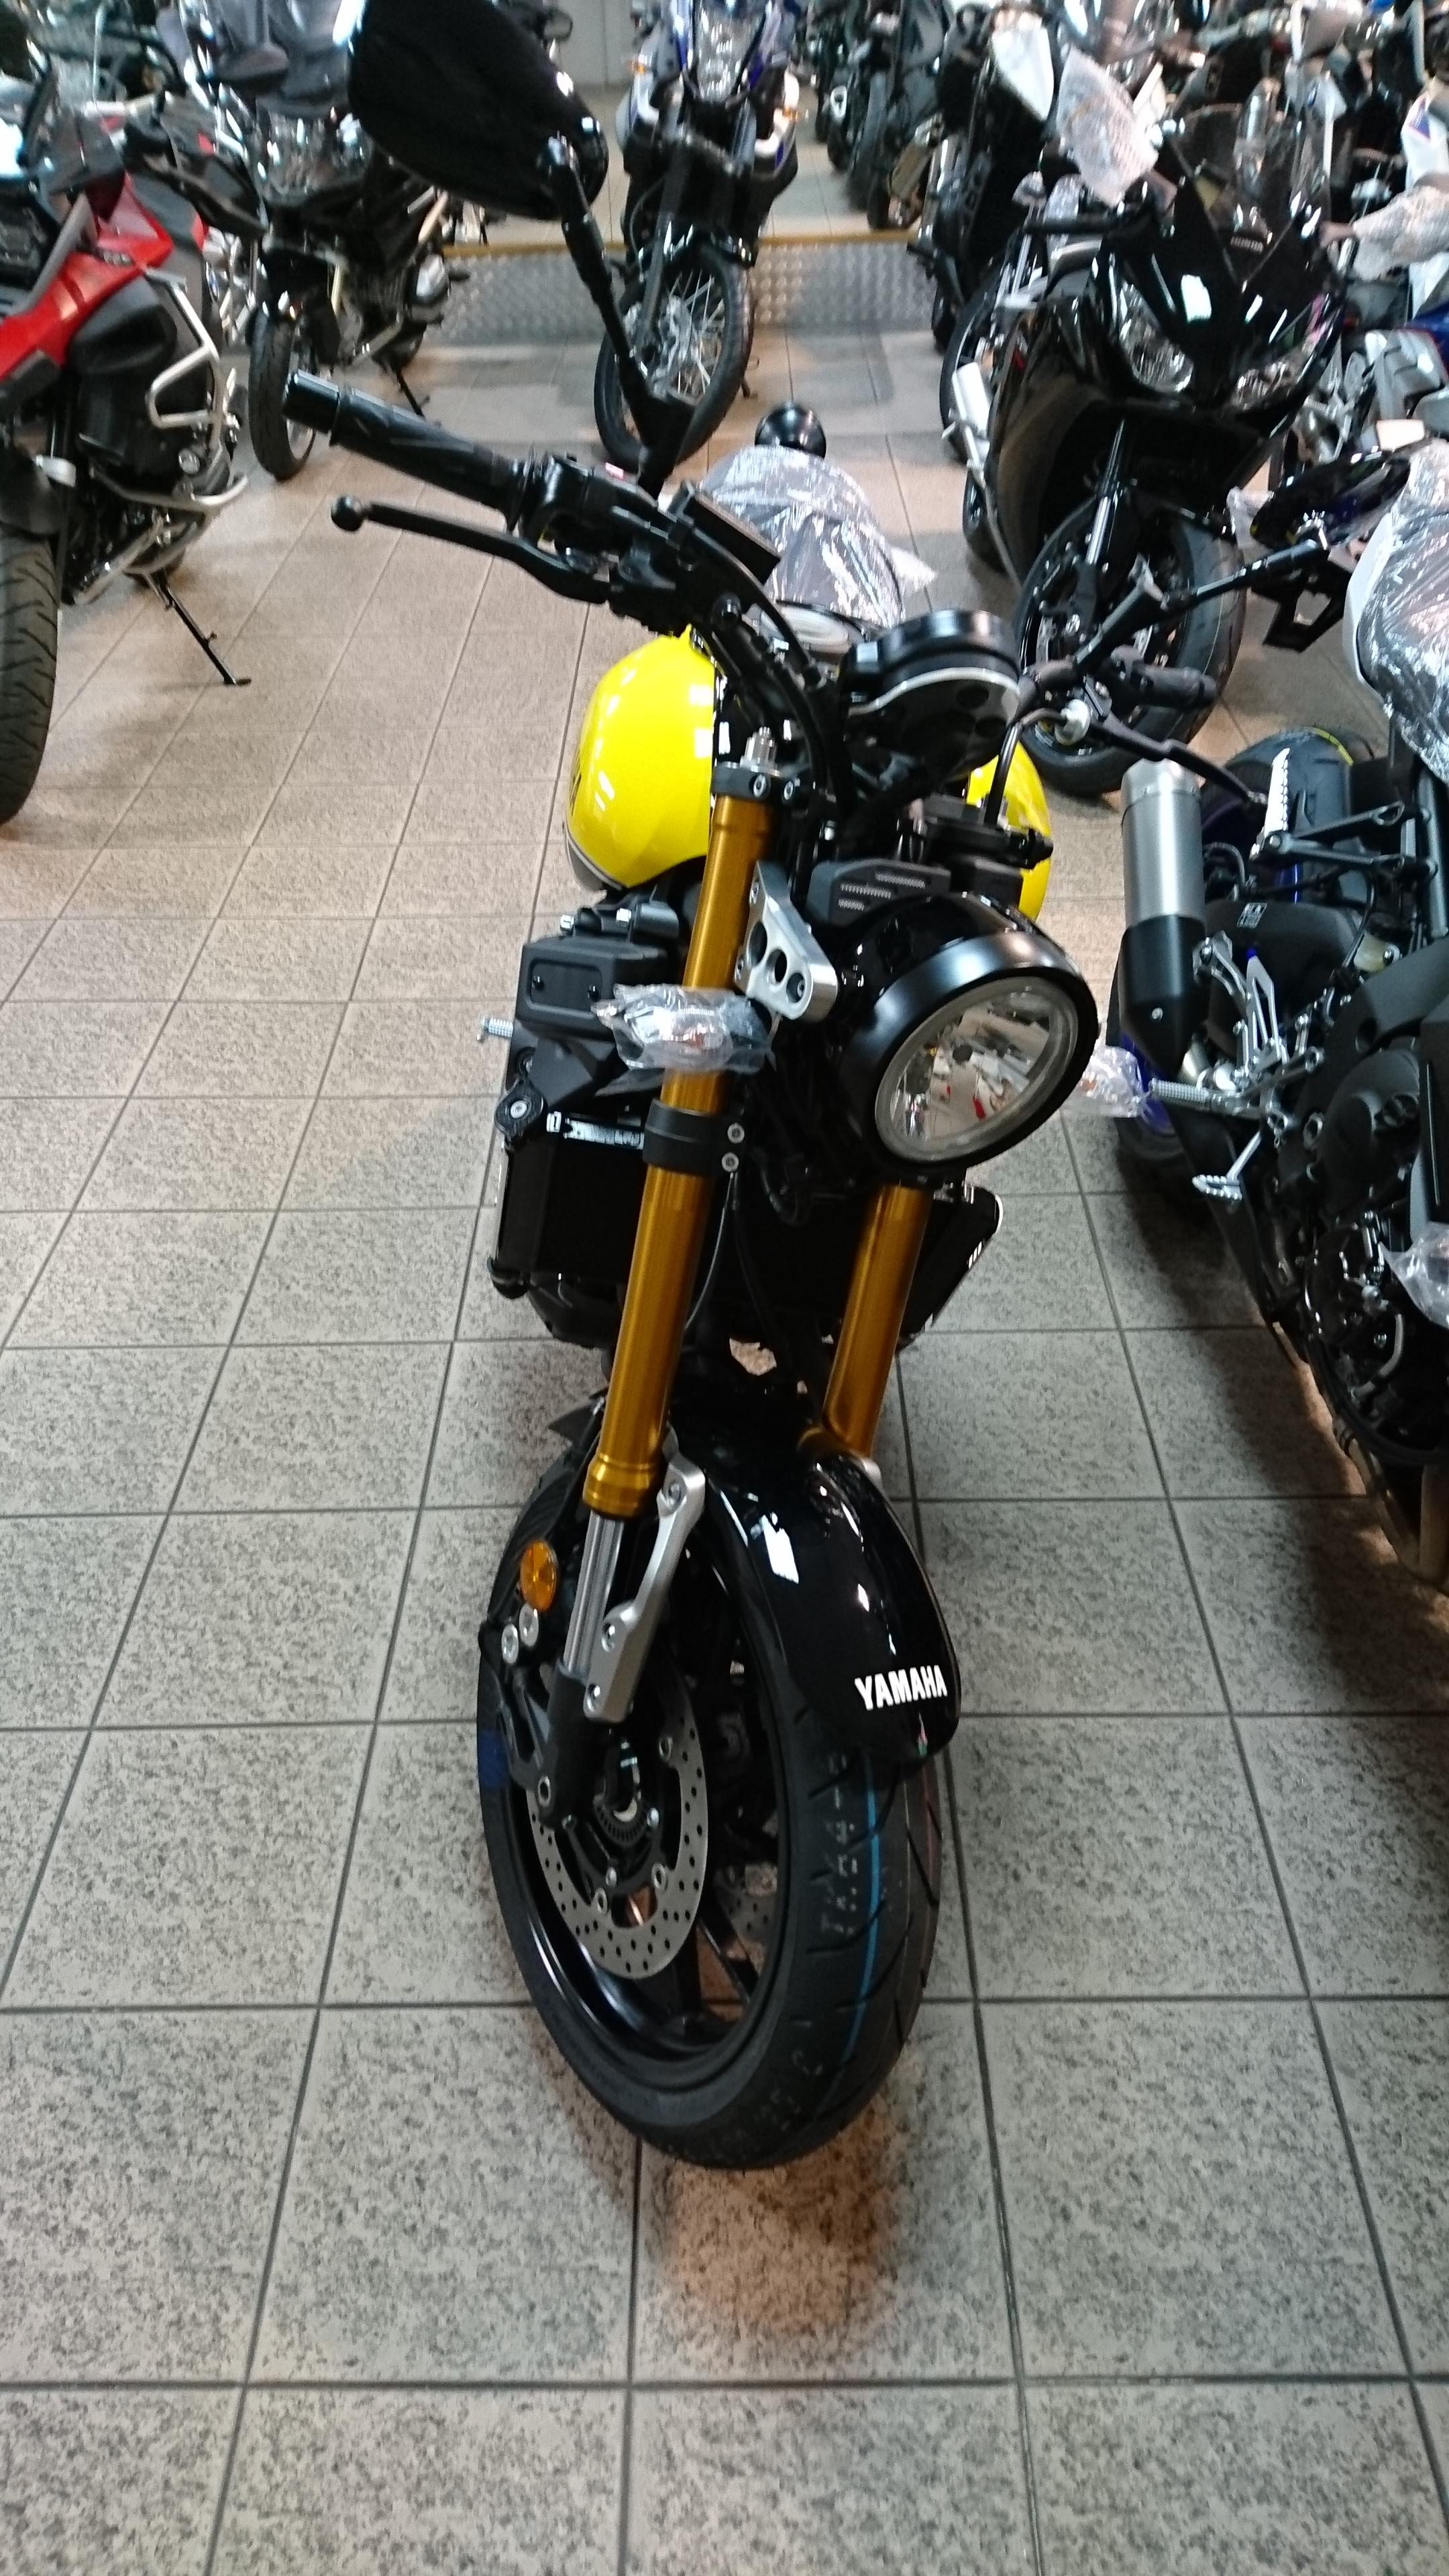 60th Anniversary Yamaha XSR900